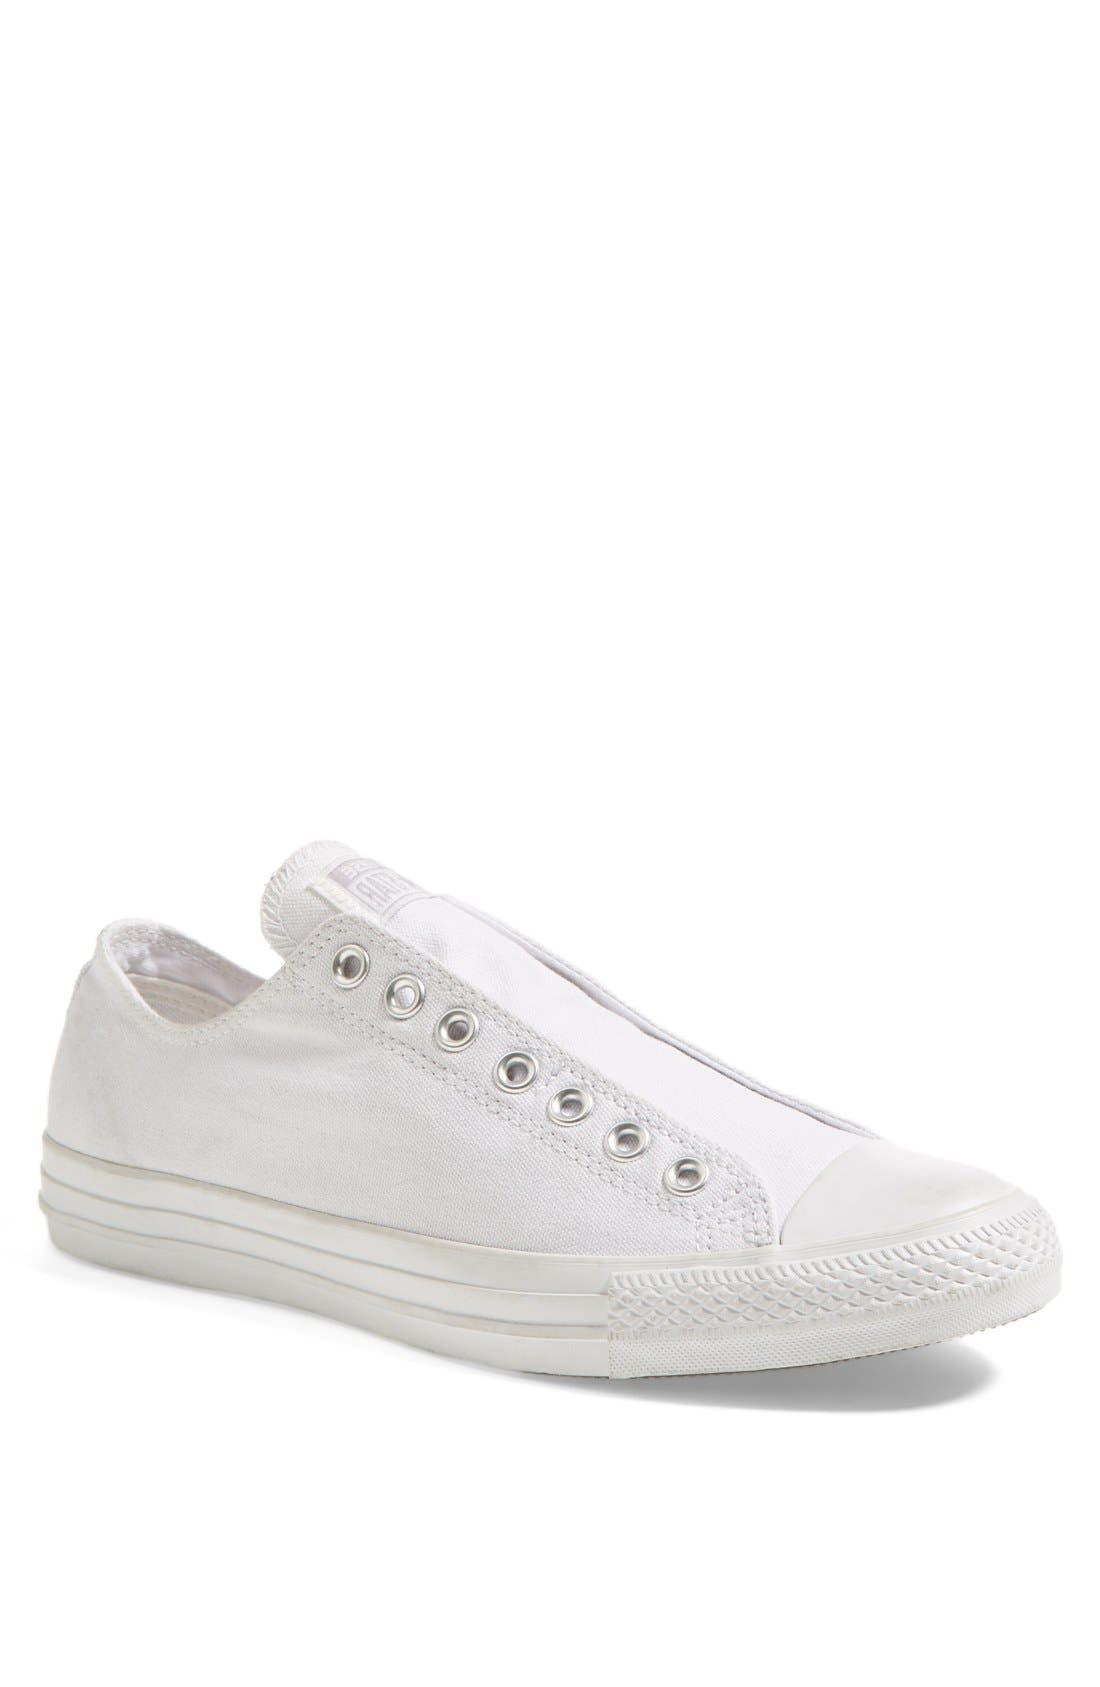 Main Image - Converse Chuck Taylor® All Star® Slip-On Sneaker (Men)